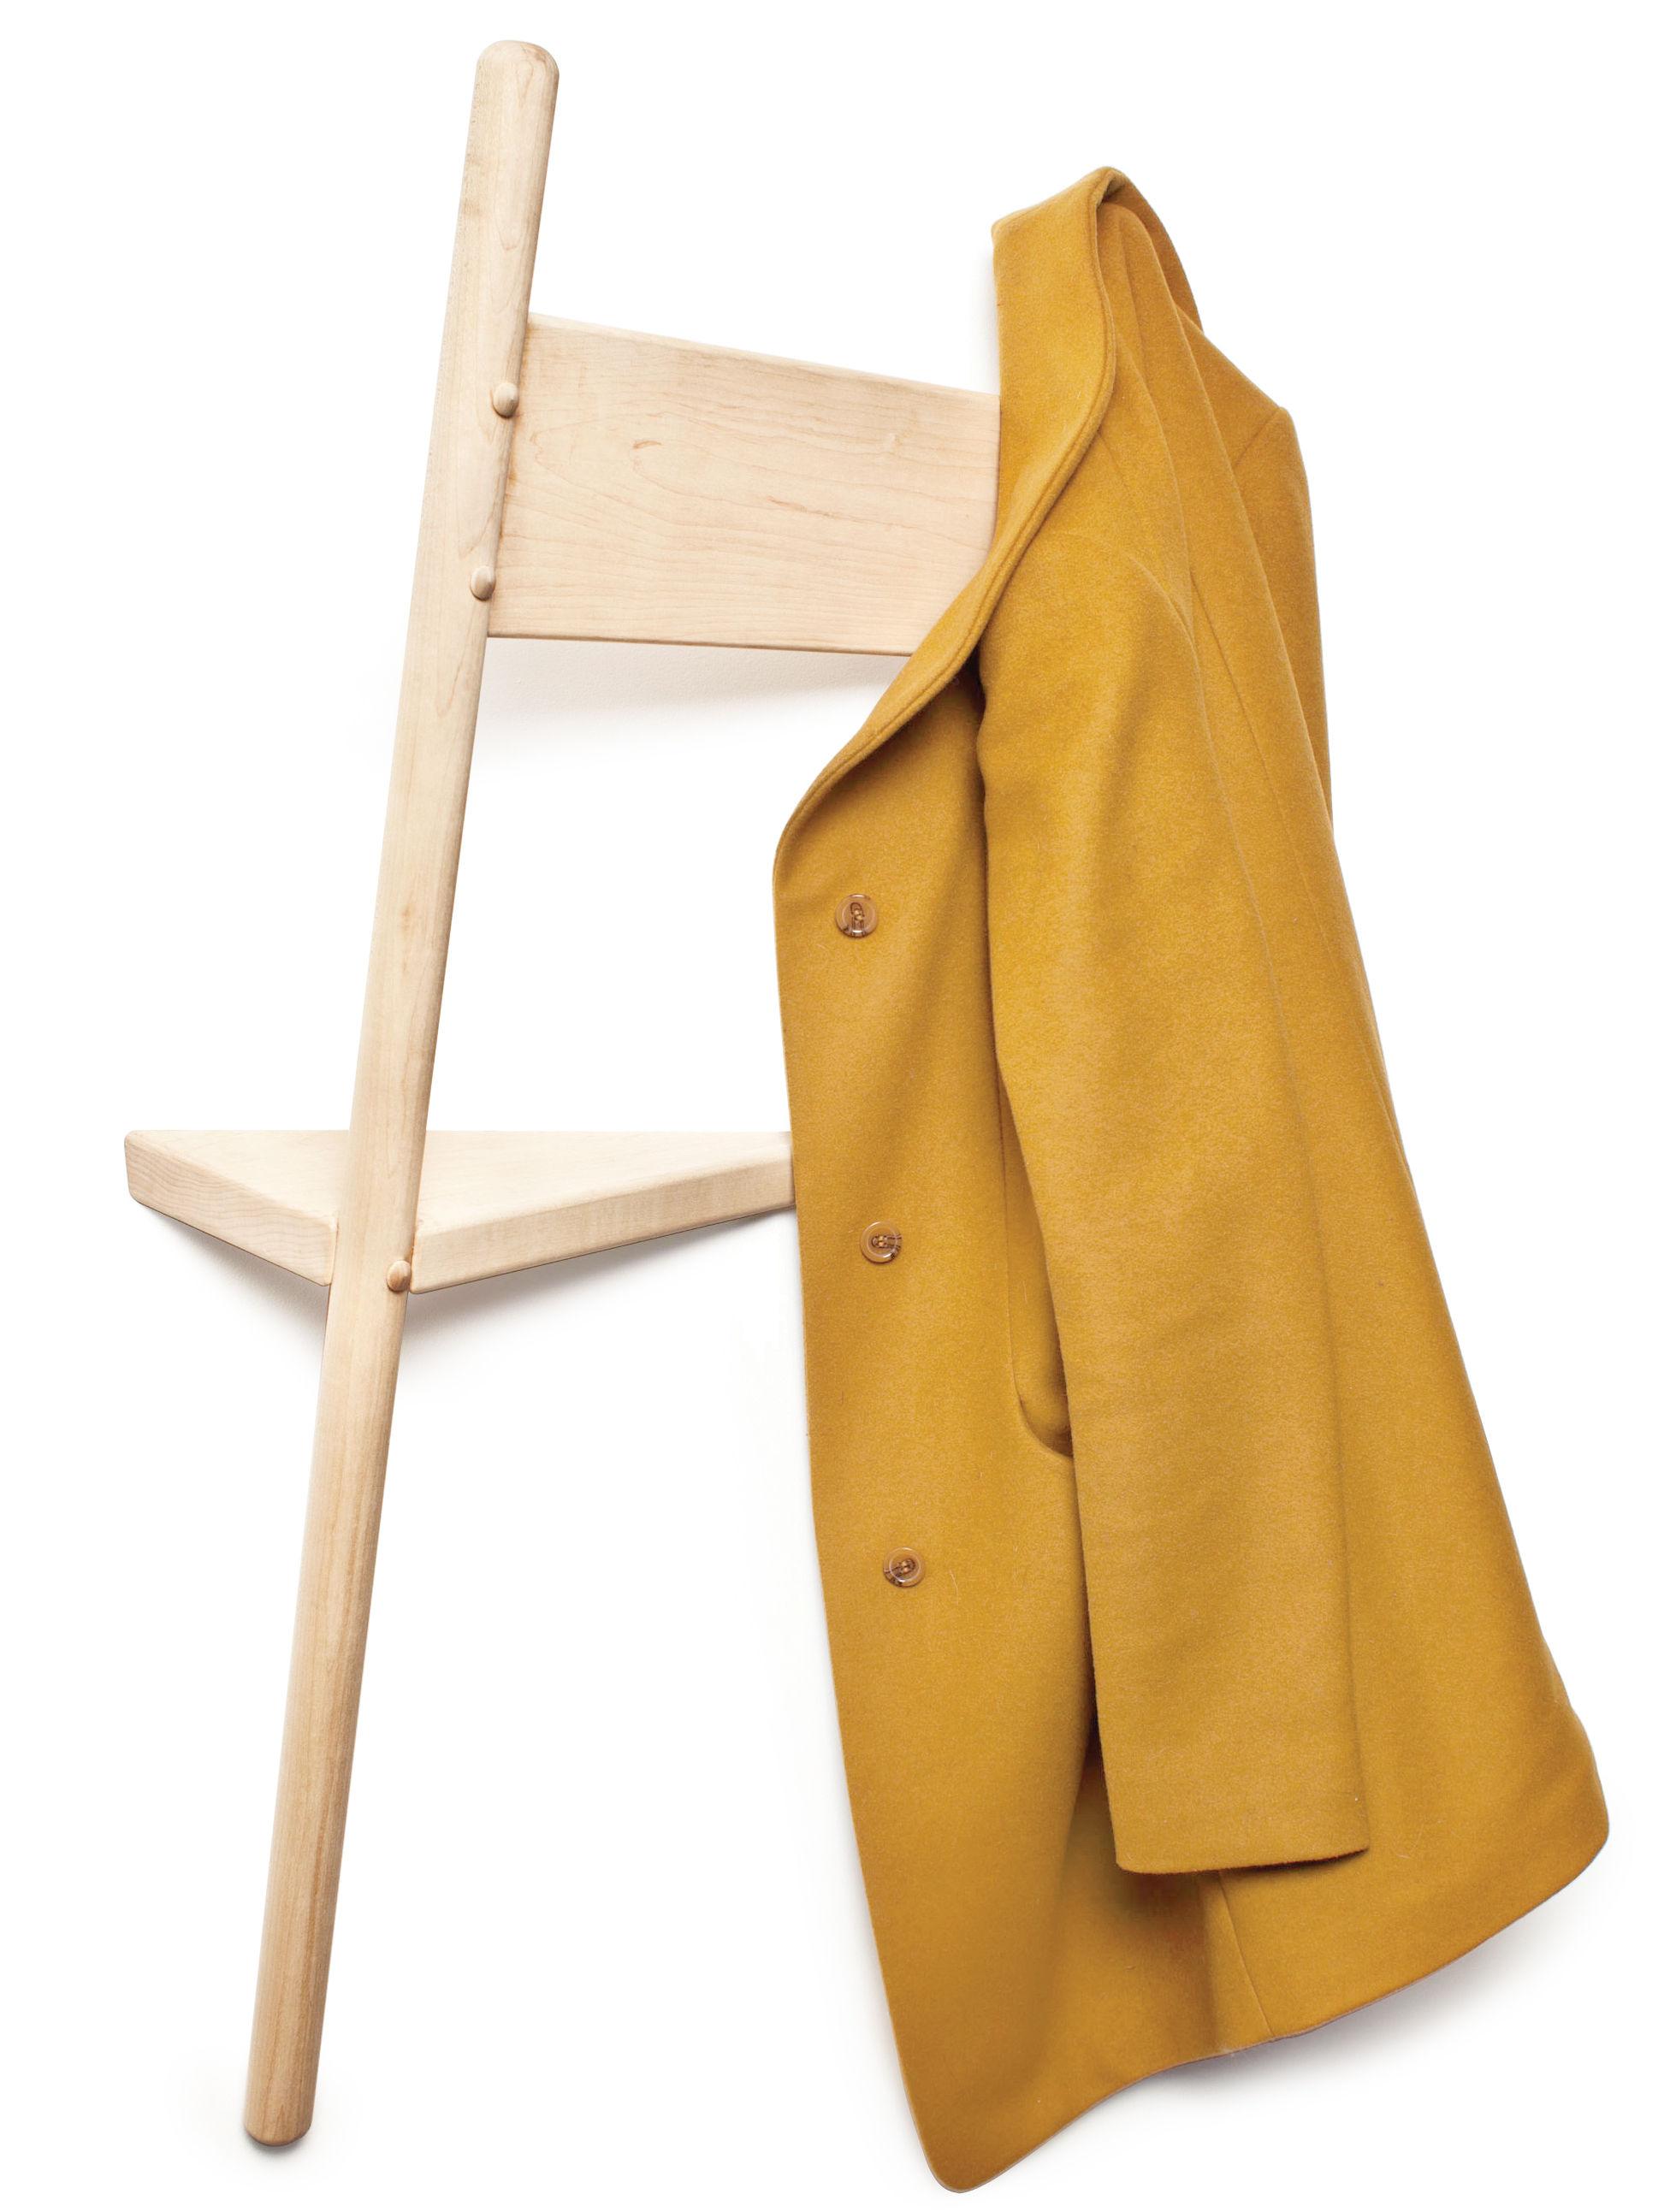 Furniture - Coat Racks & Pegs - Wallhax Wall coat rack by ENOstudio - Natural oak - Oak